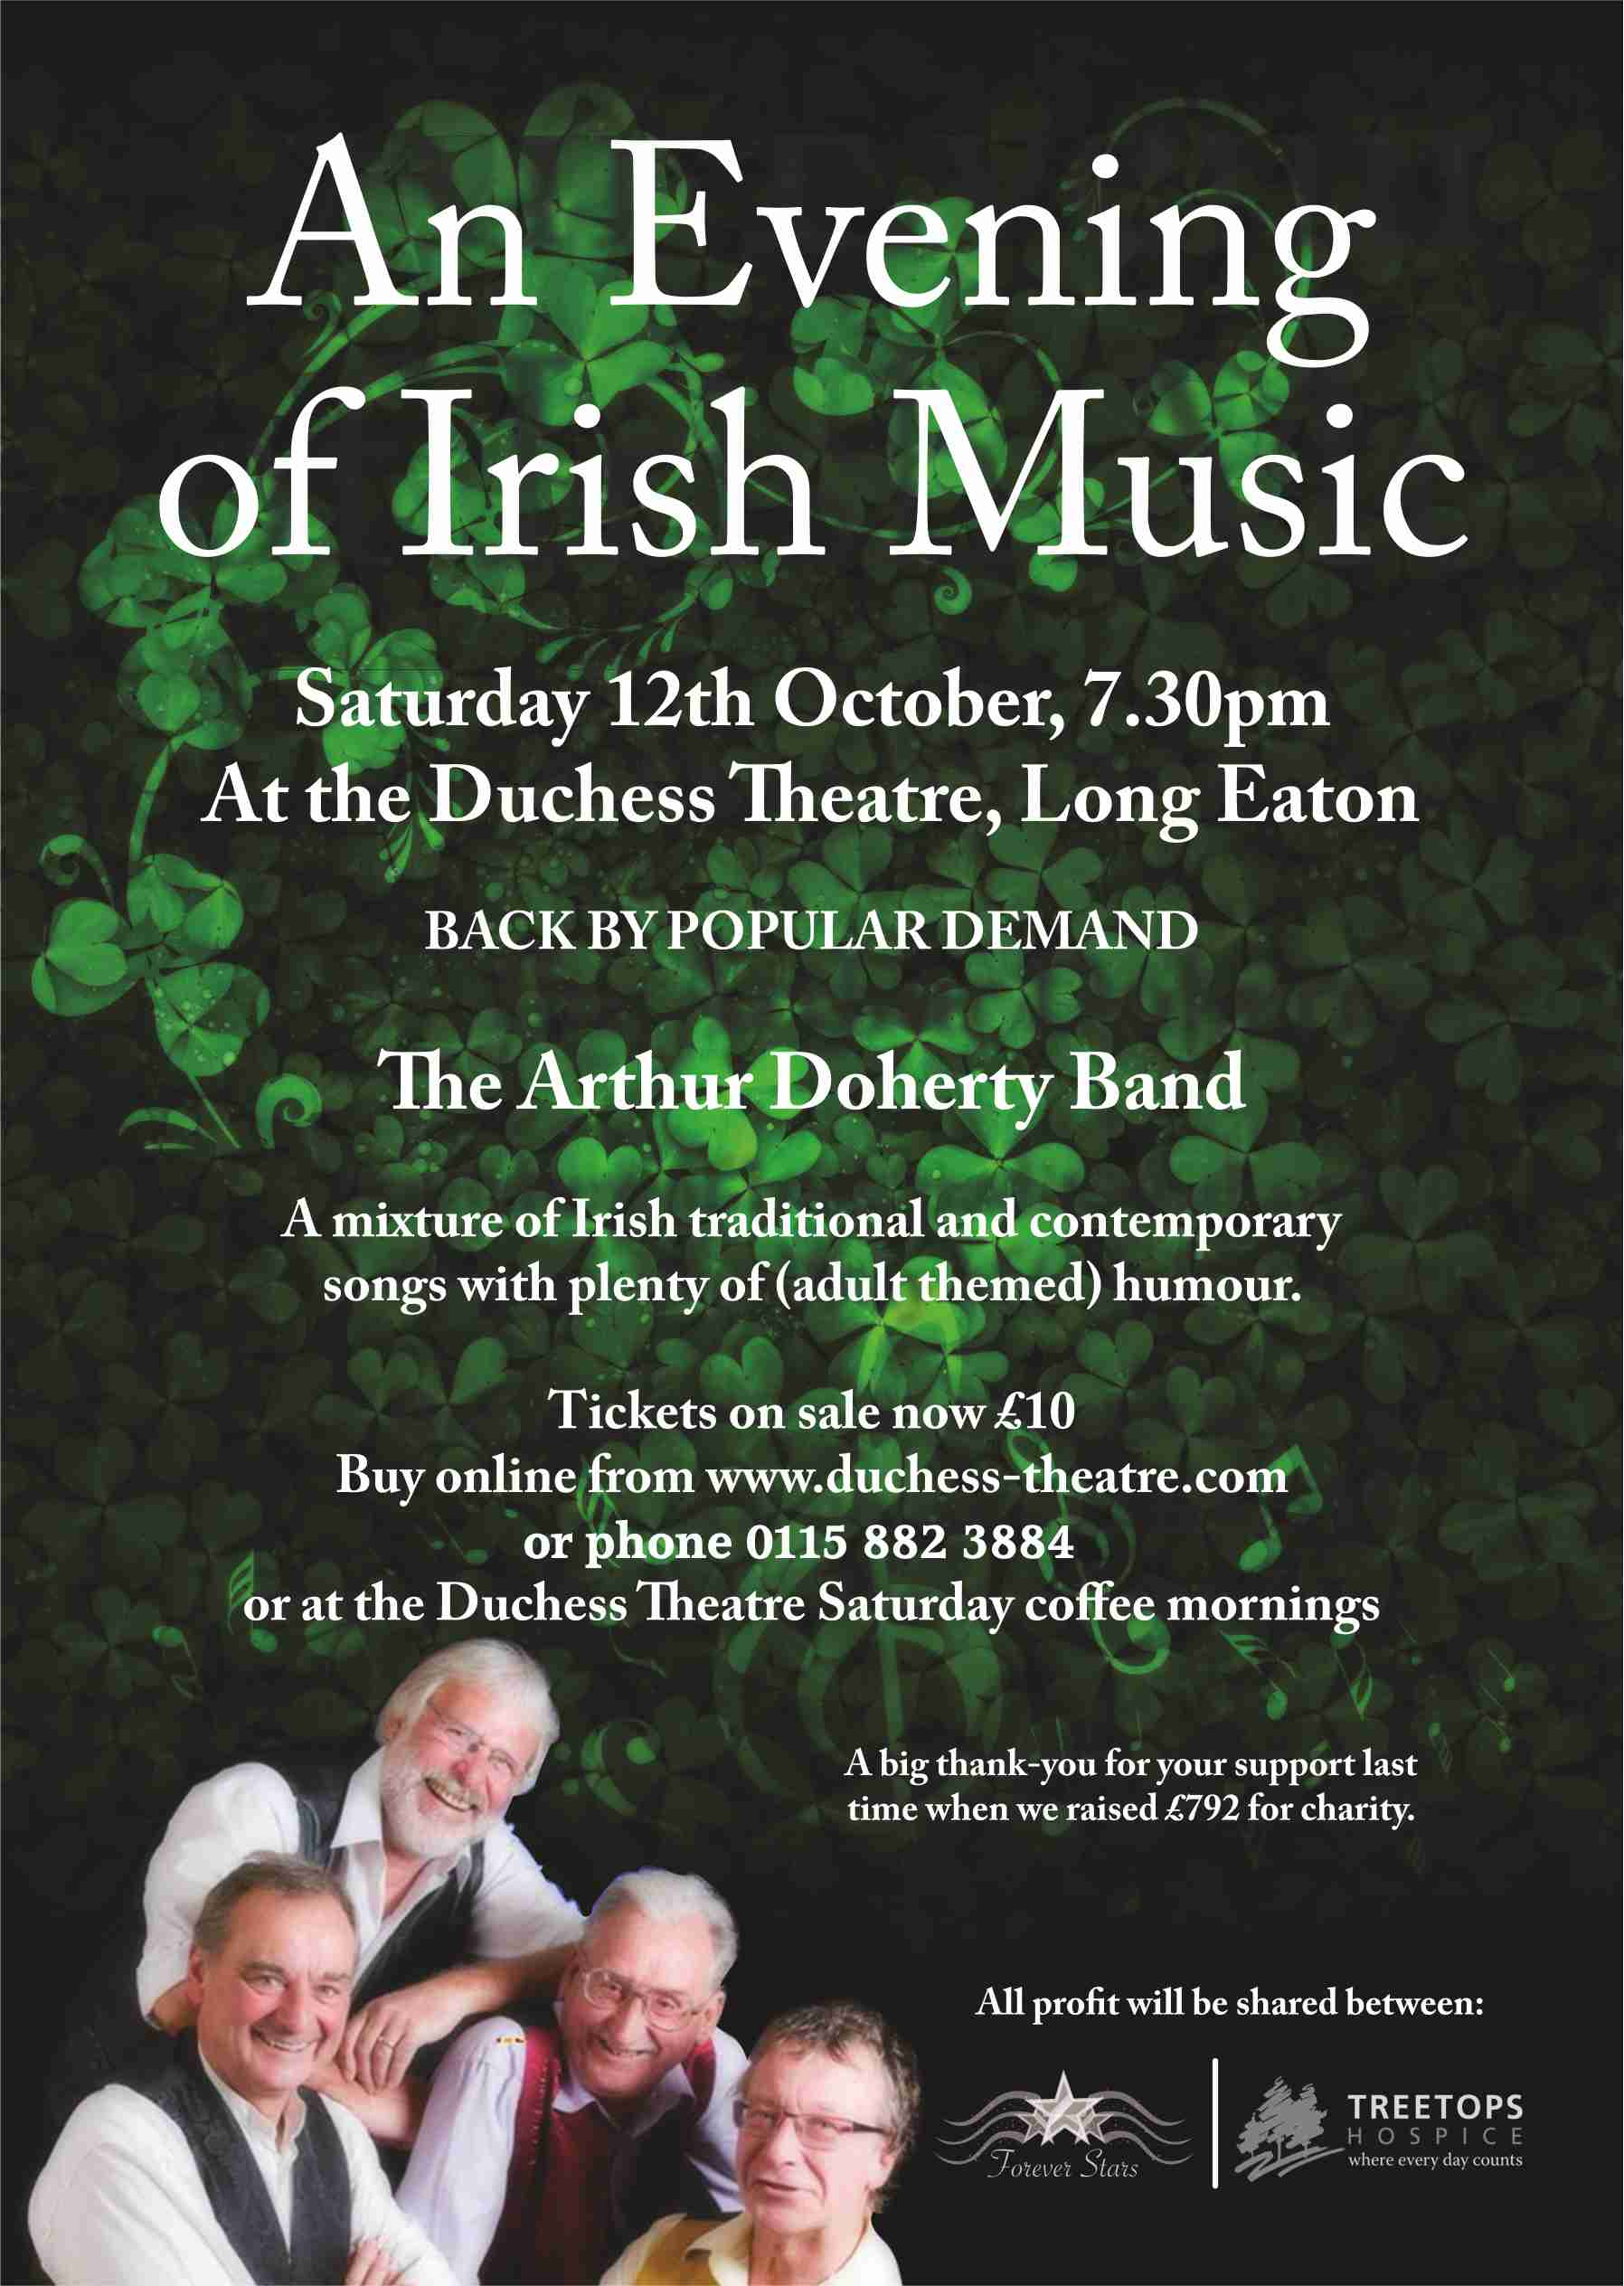 EVENING OF IRISH MUSIC - The Arthur Doherty Band banner image